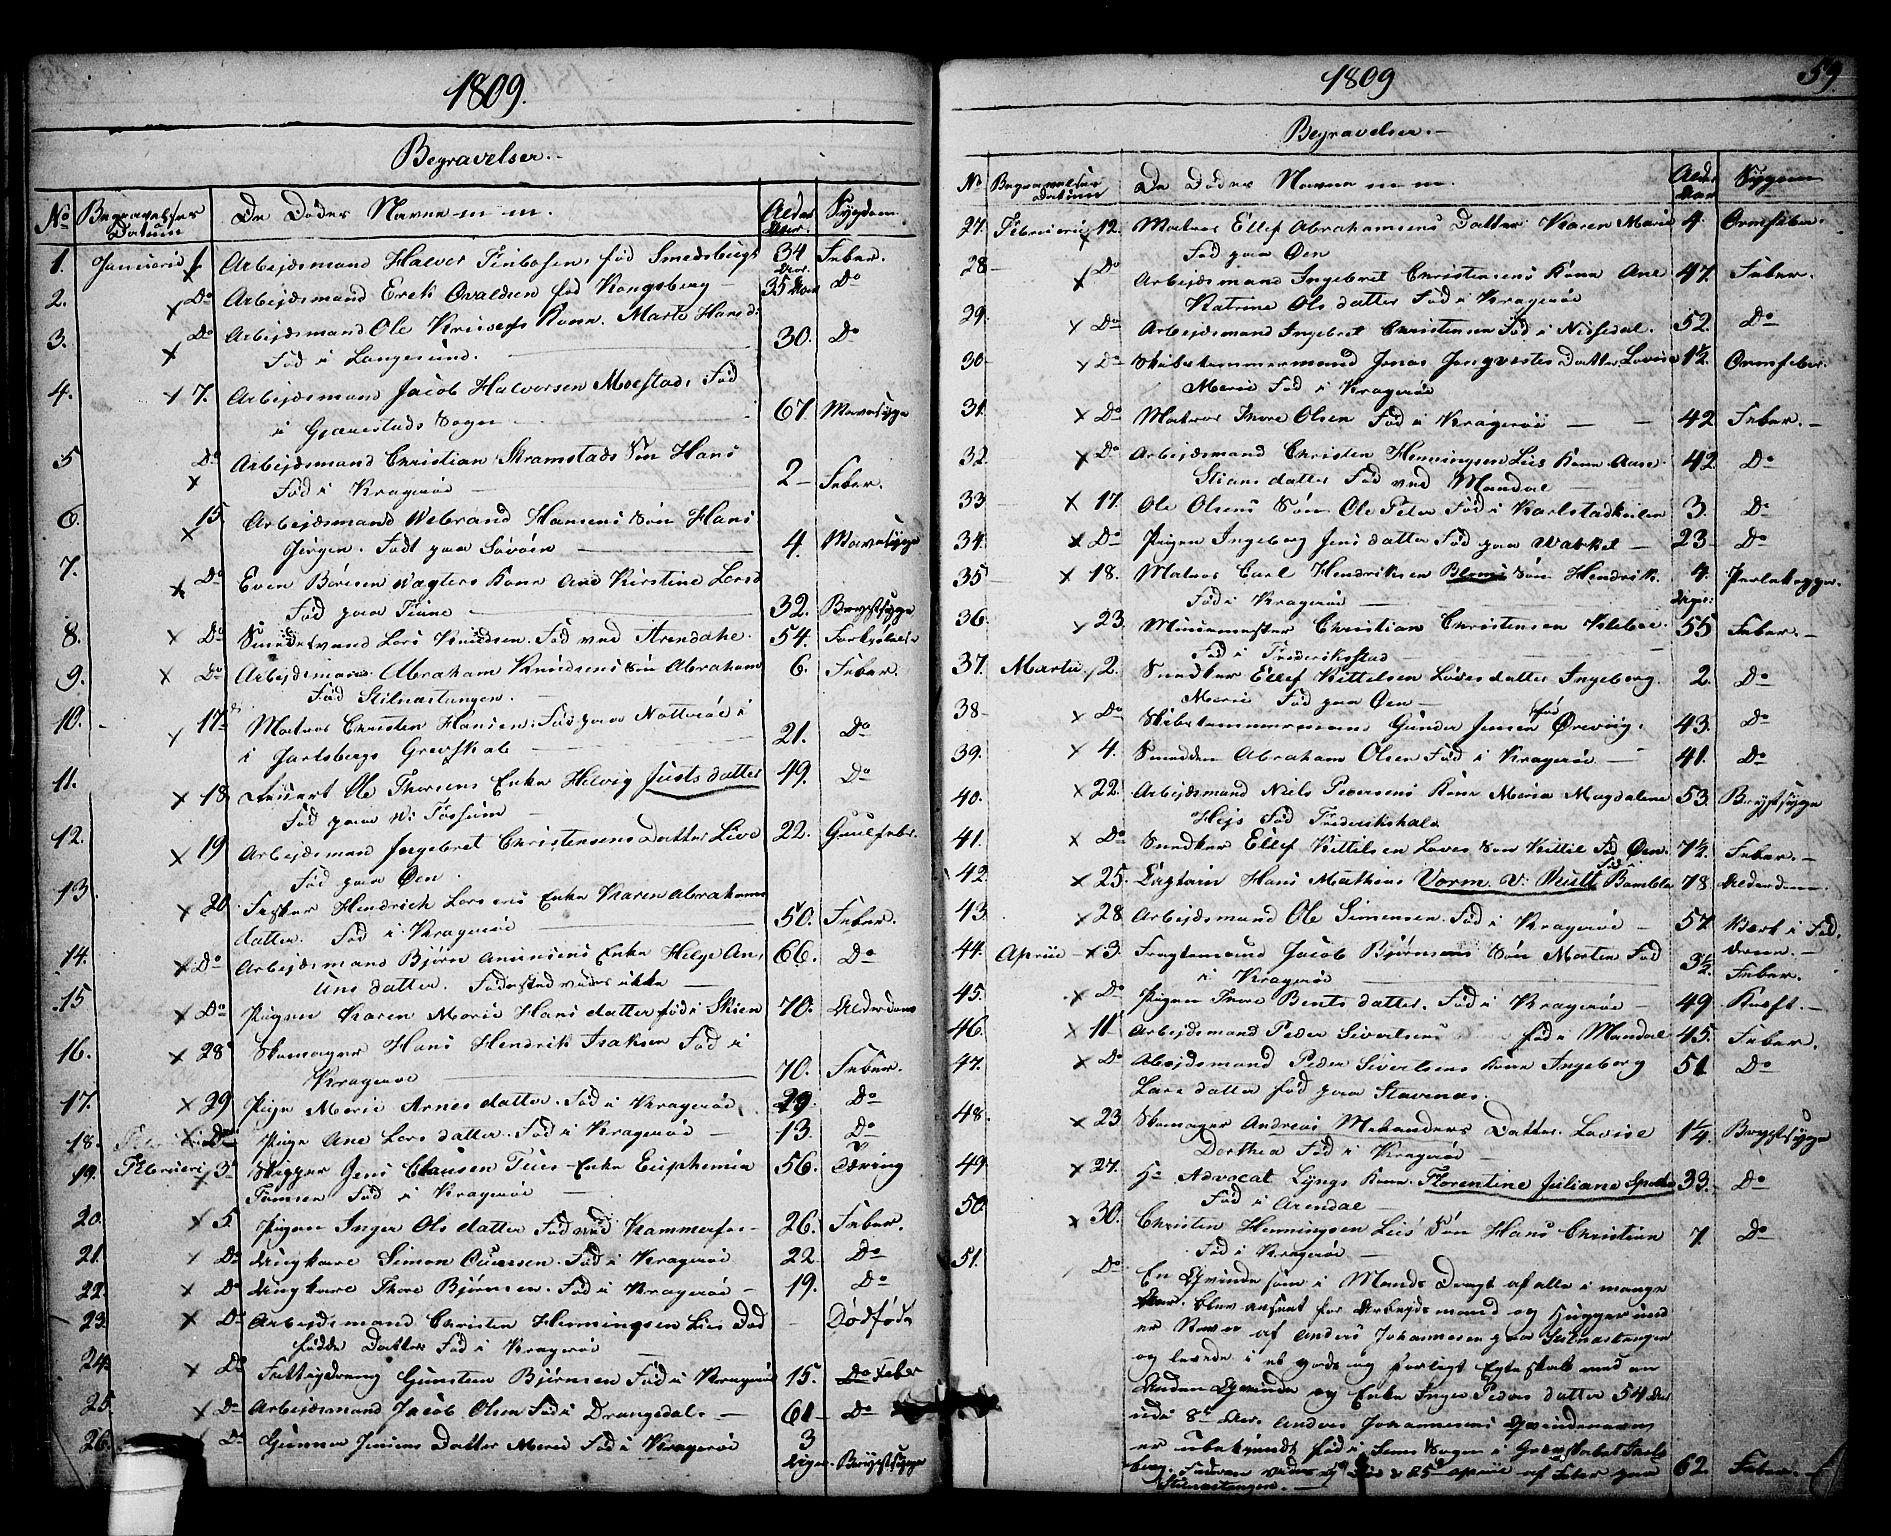 SAKO, Kragerø kirkebøker, F/Fa/L0003: Ministerialbok nr. 3, 1802-1813, s. 59